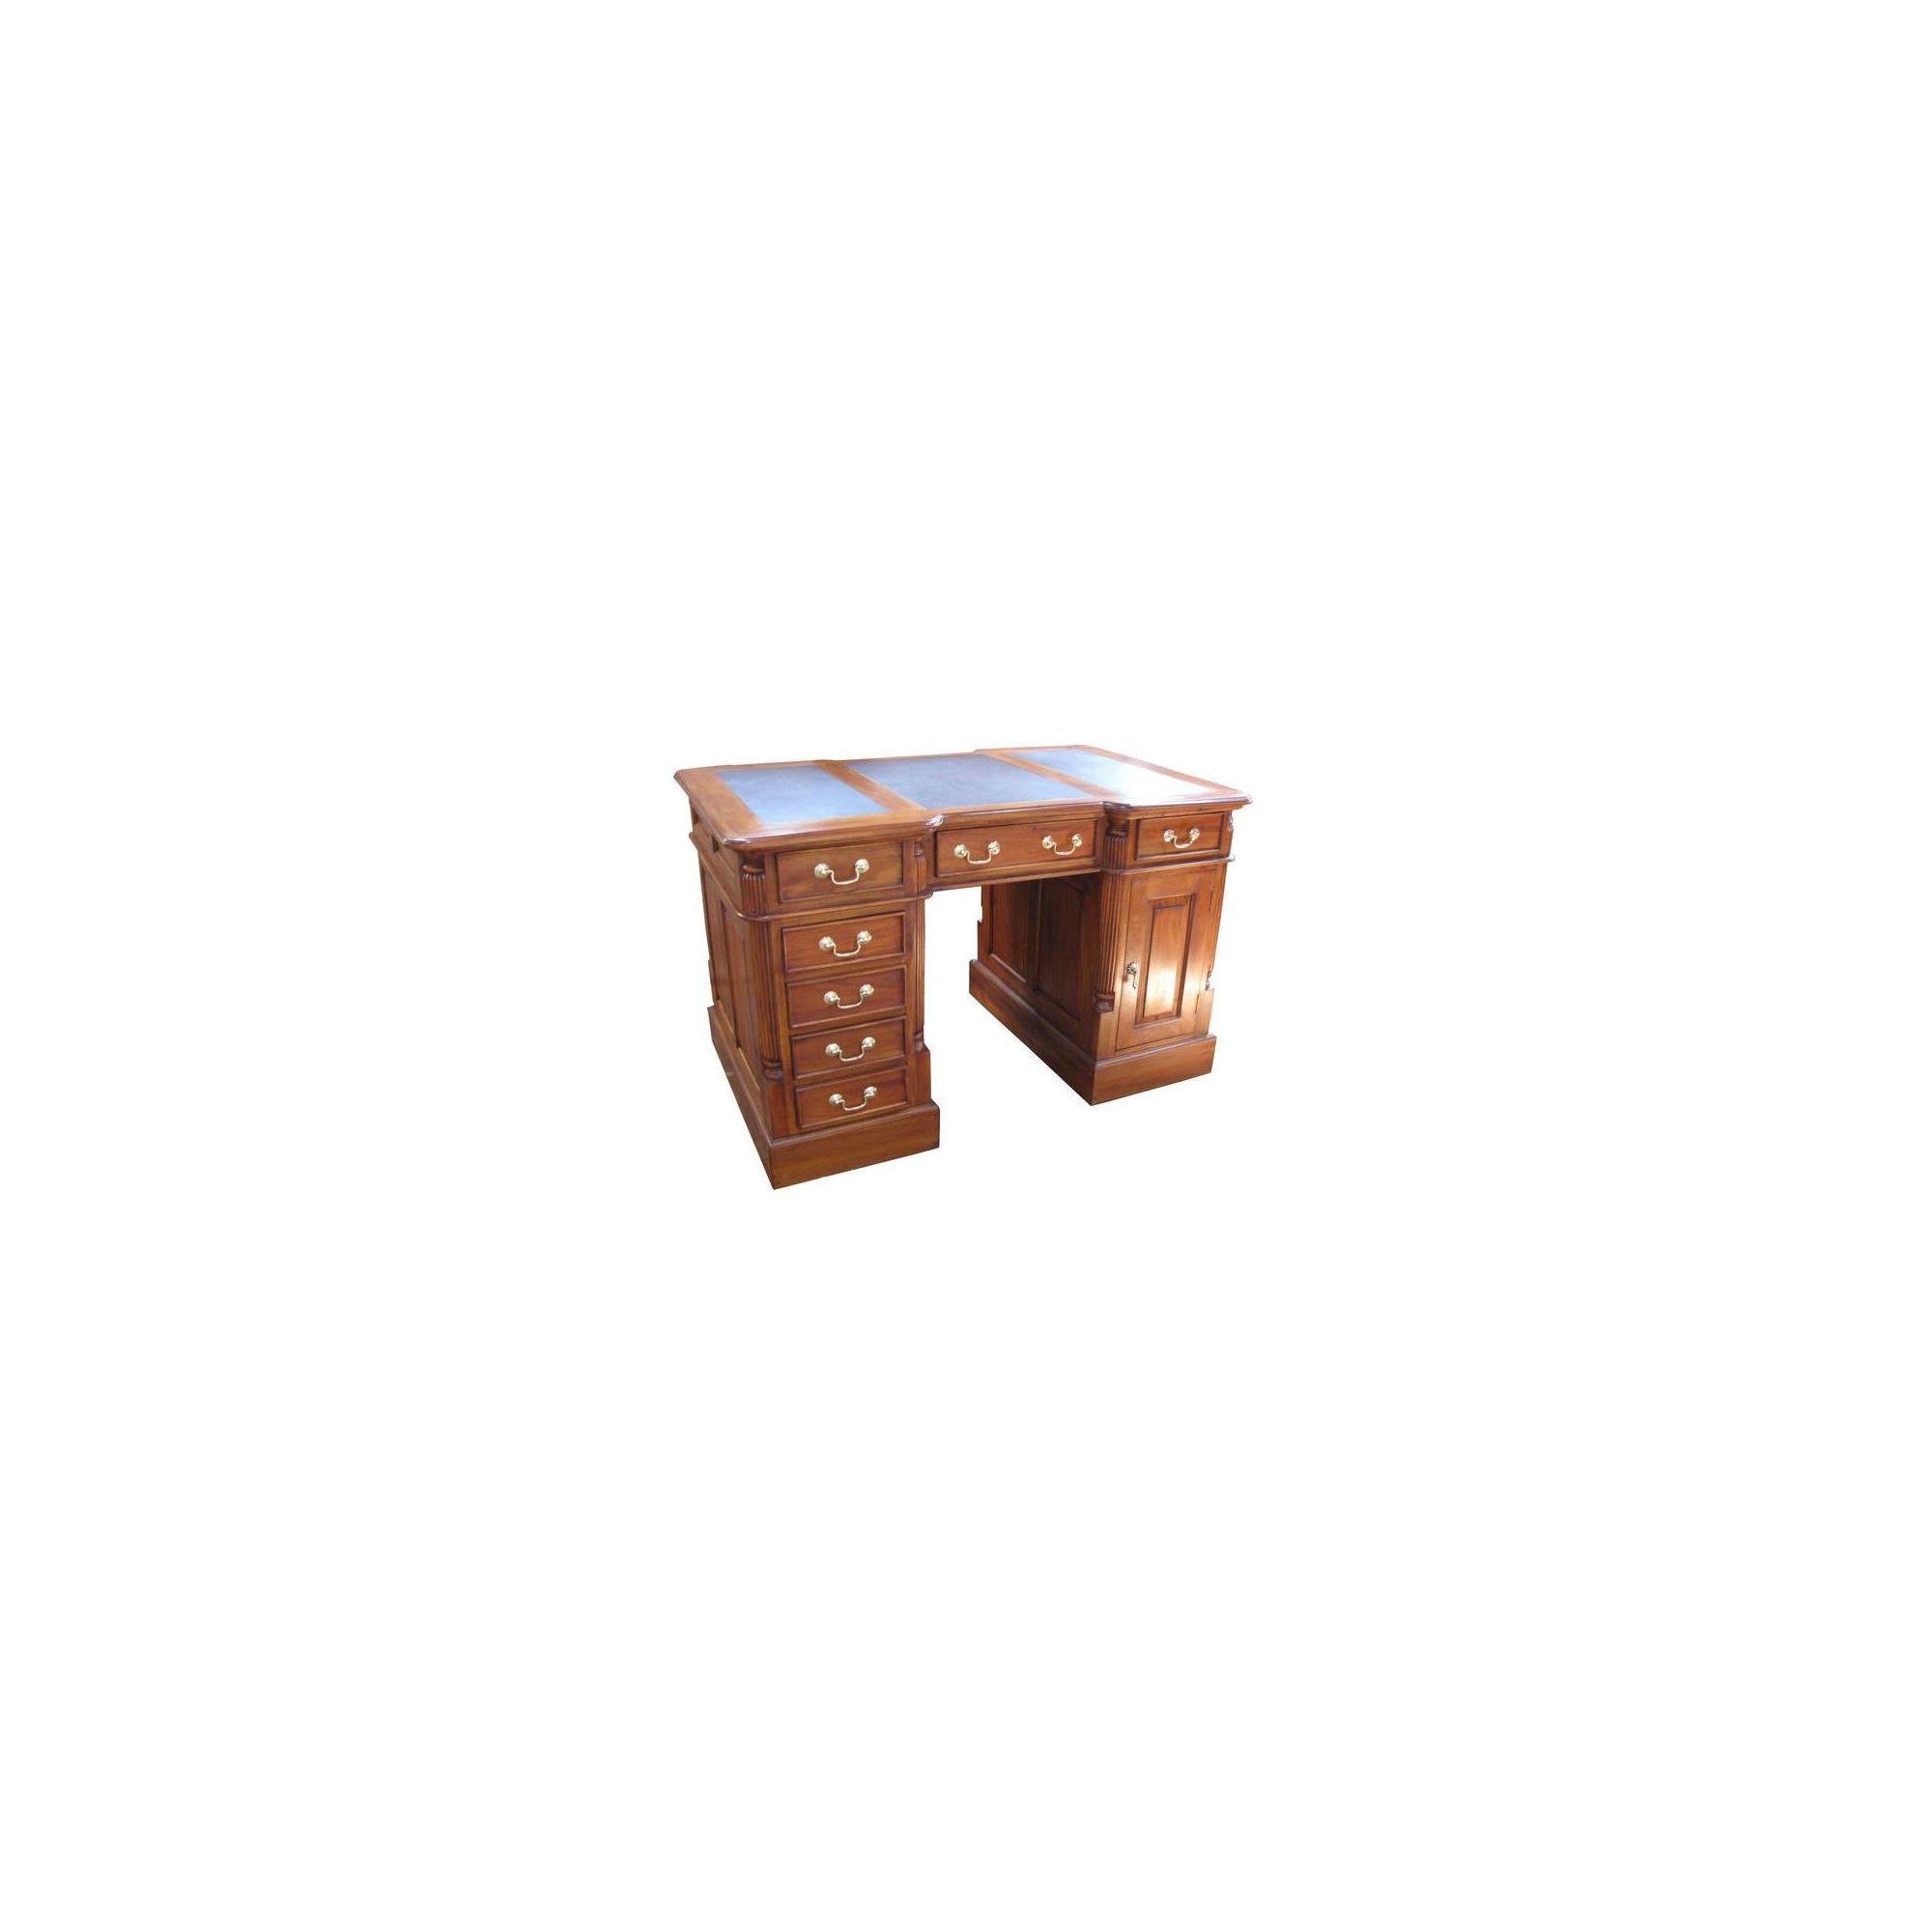 Lock stock and barrel Mahogany Small Pedestal Desk in Mahogany at Tesco Direct